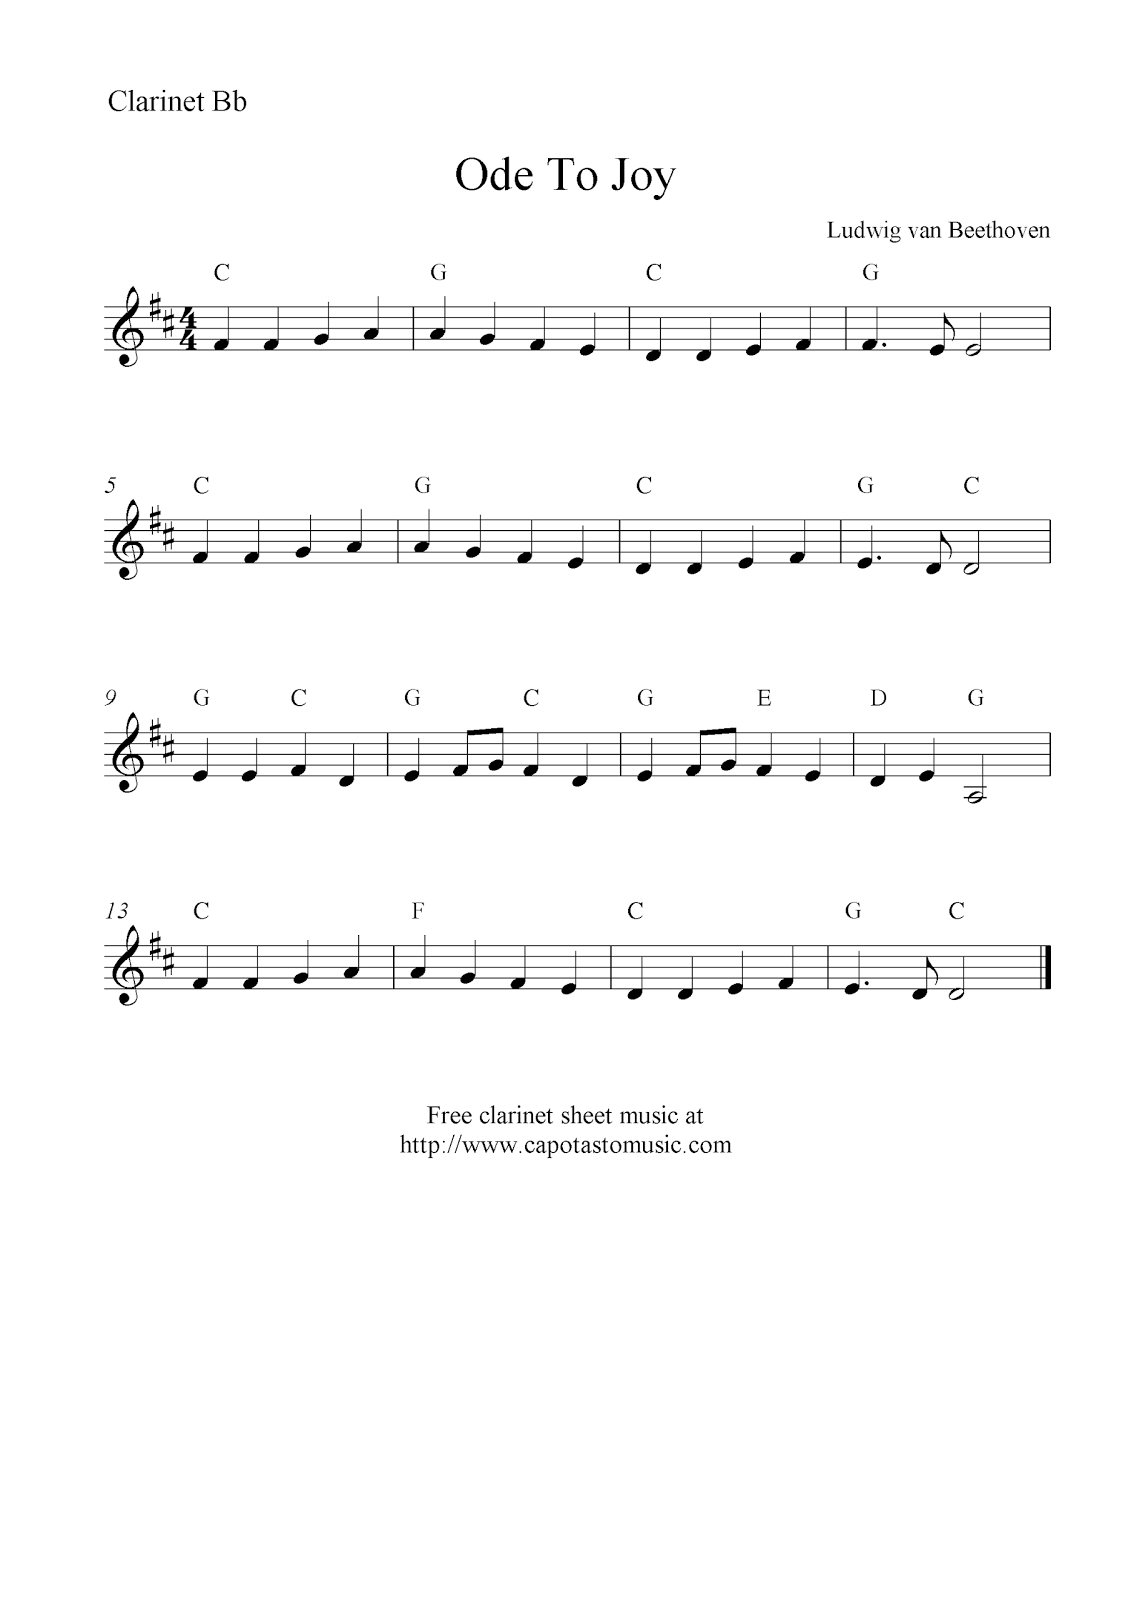 Ode To Joybeethoven, Free Clarinet Sheet Music Notes - Free Sheet Music For Clarinet Printable